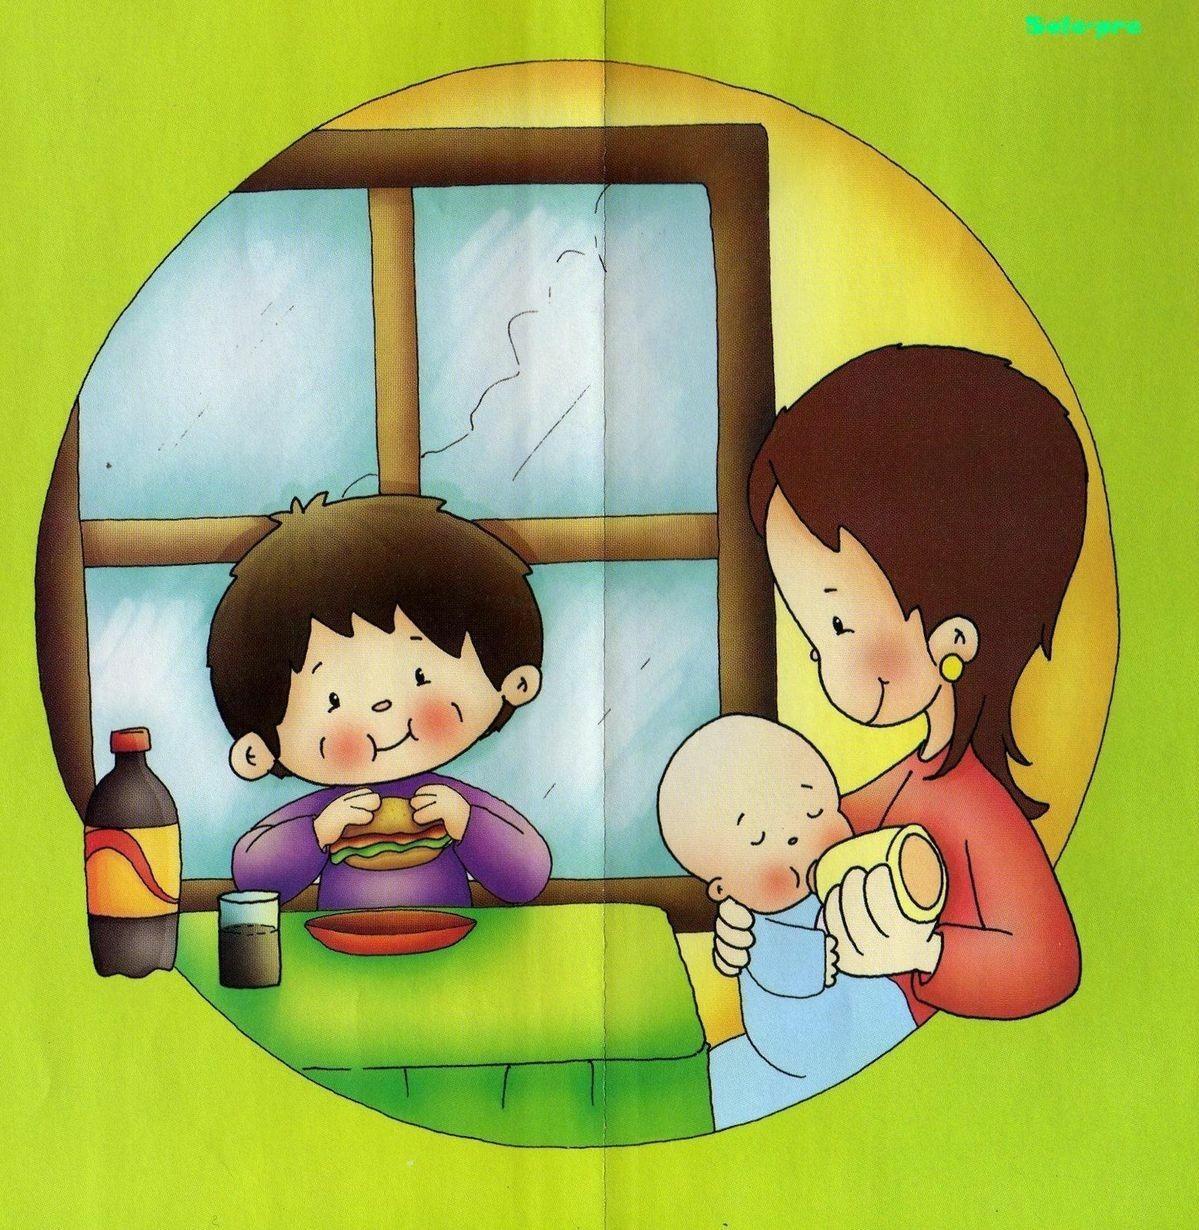 Derecho a la alimentación   Art wall kids, Childrens rights, Clip art